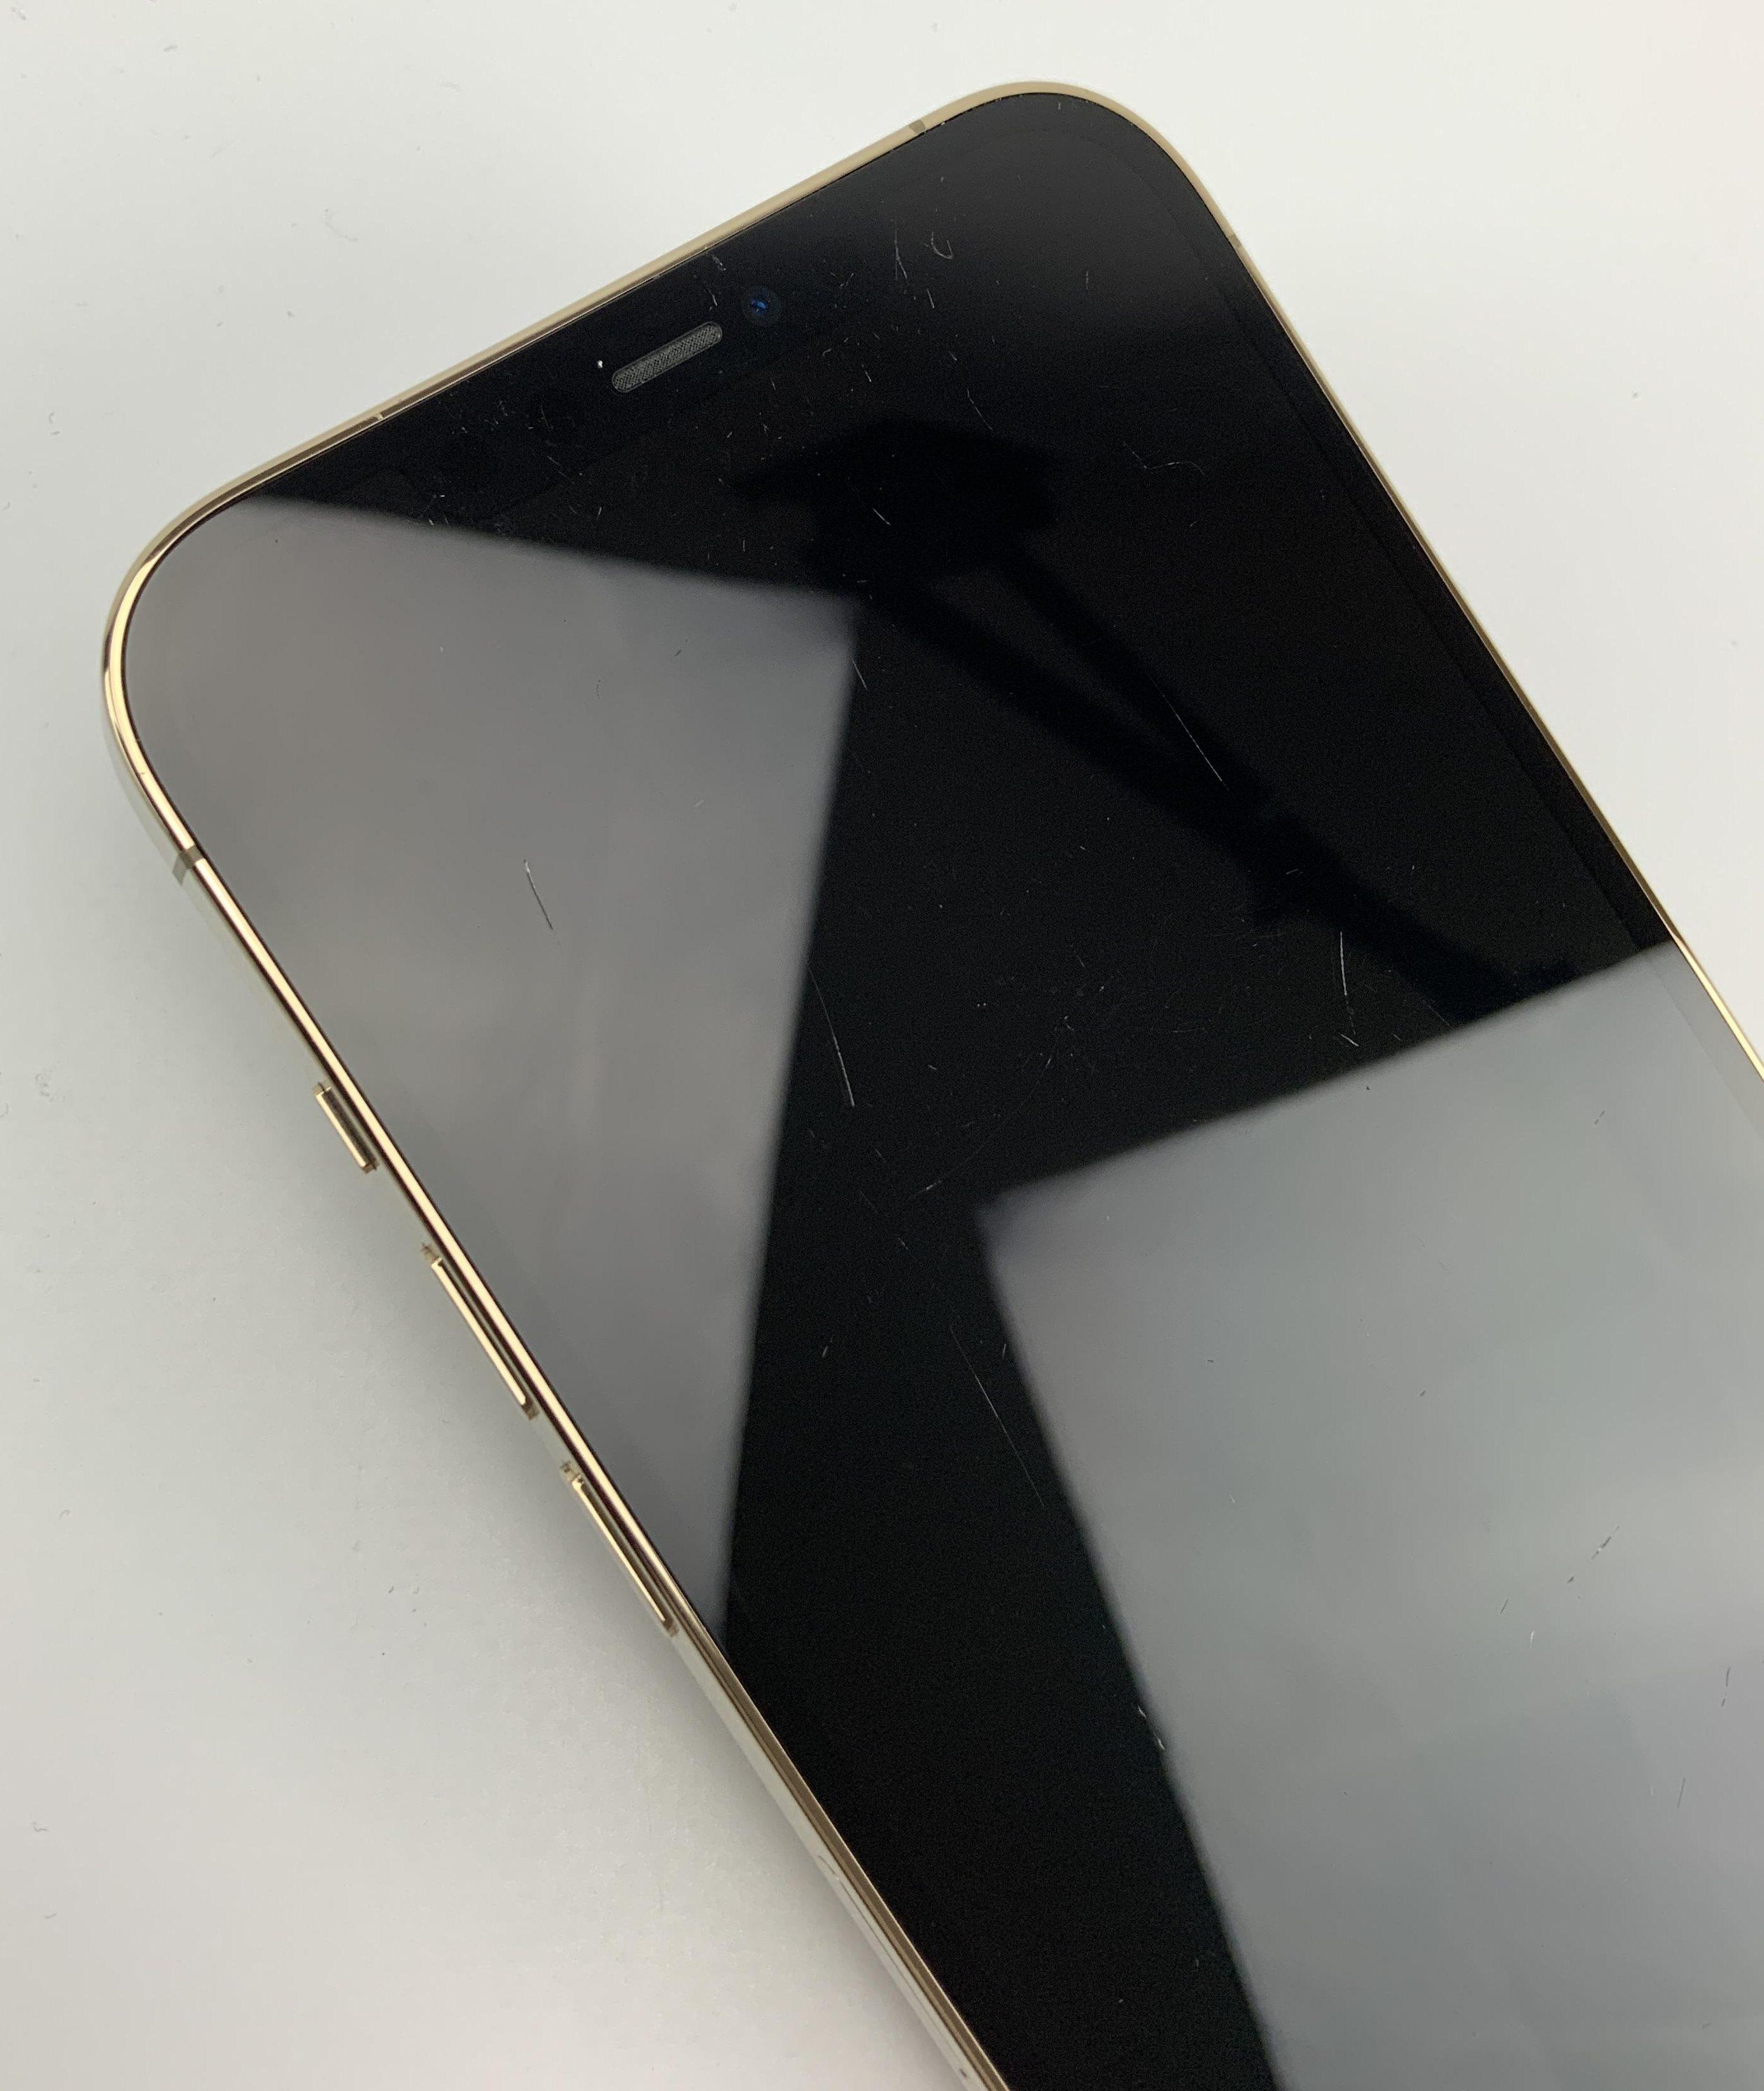 iPhone 12 Pro Max 256GB, 256GB, Gold, Bild 3